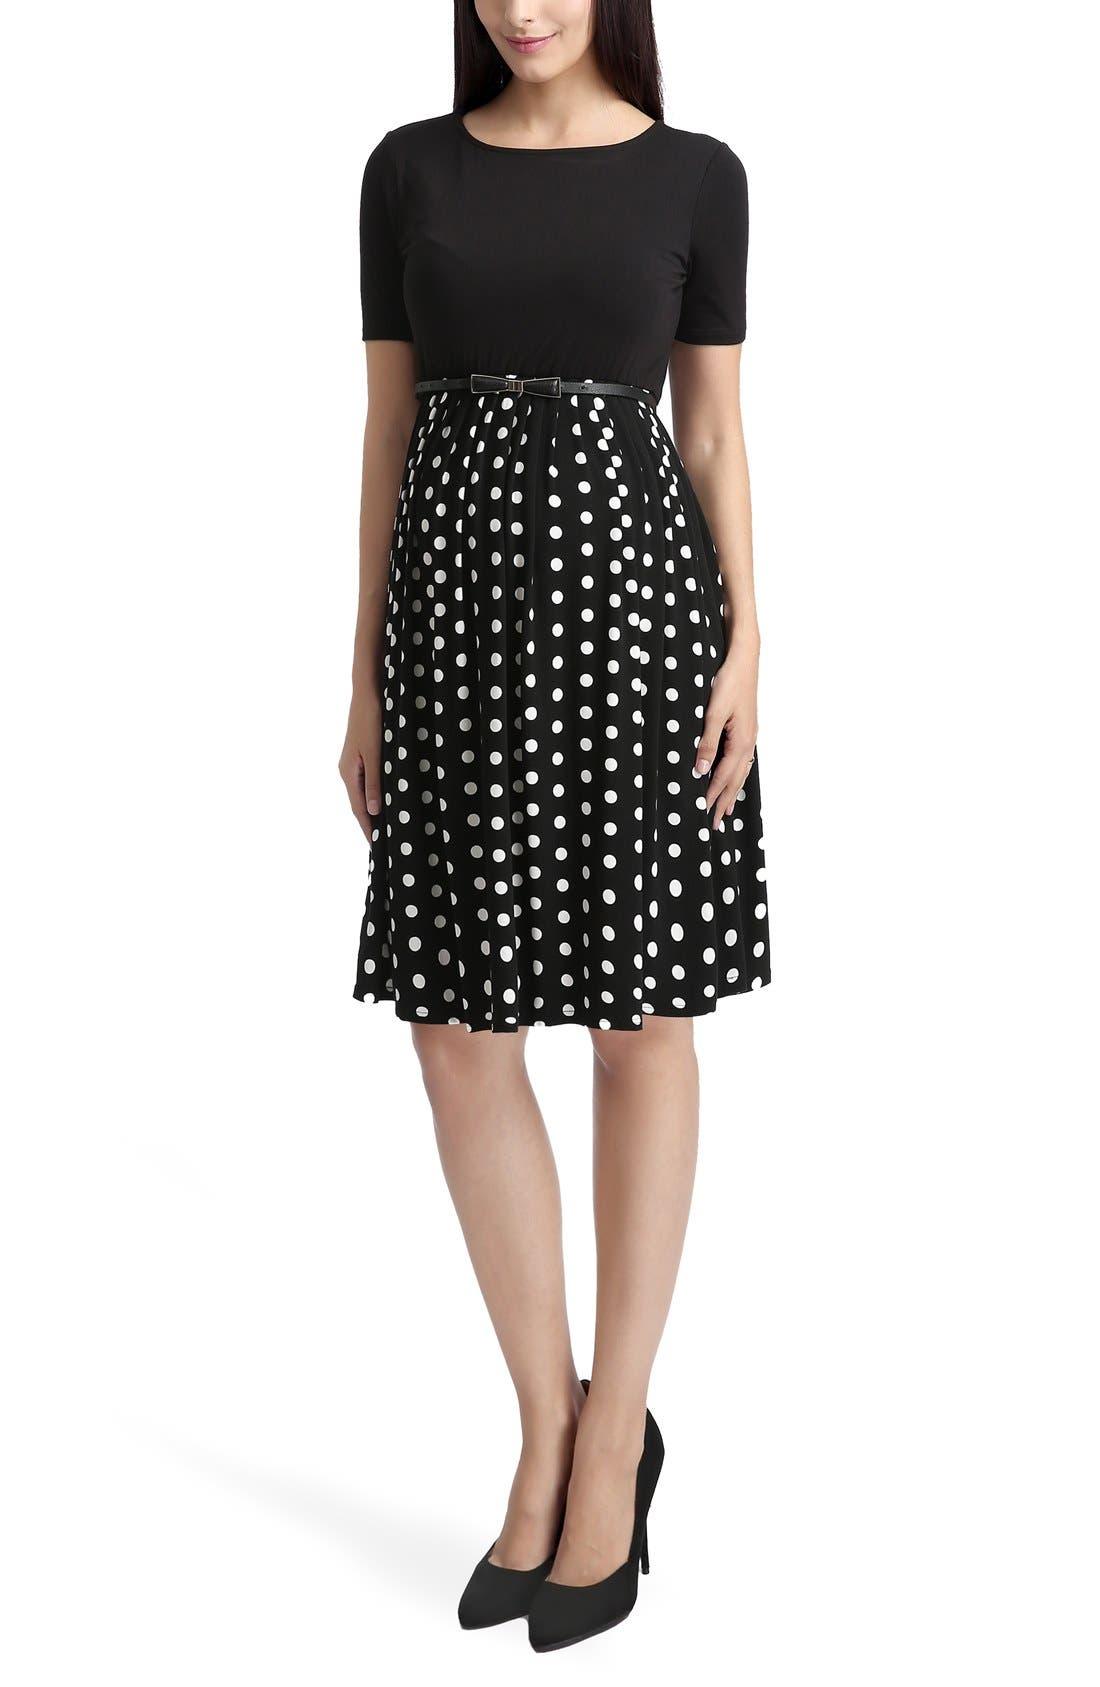 Alternate Image 1 Selected - Kimi and Kai 'Emmy' Polka Dot Maternity Dress